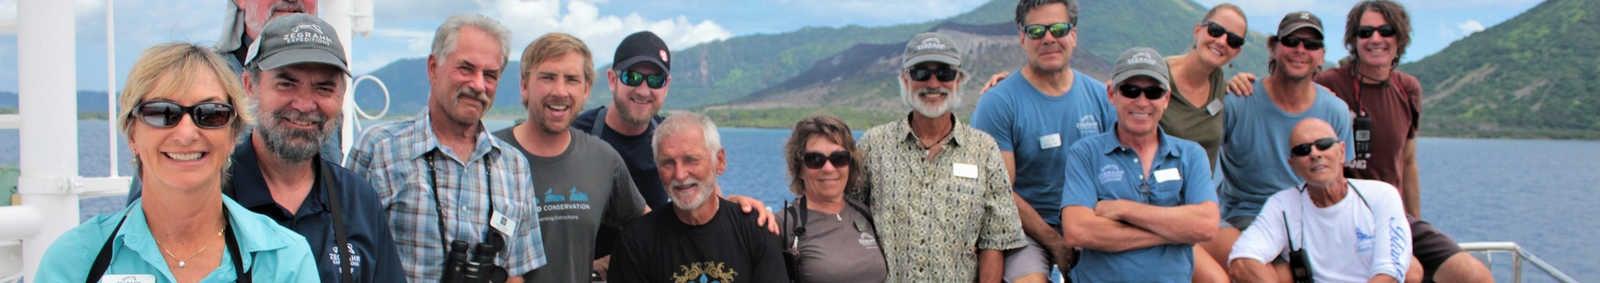 Expedition staff